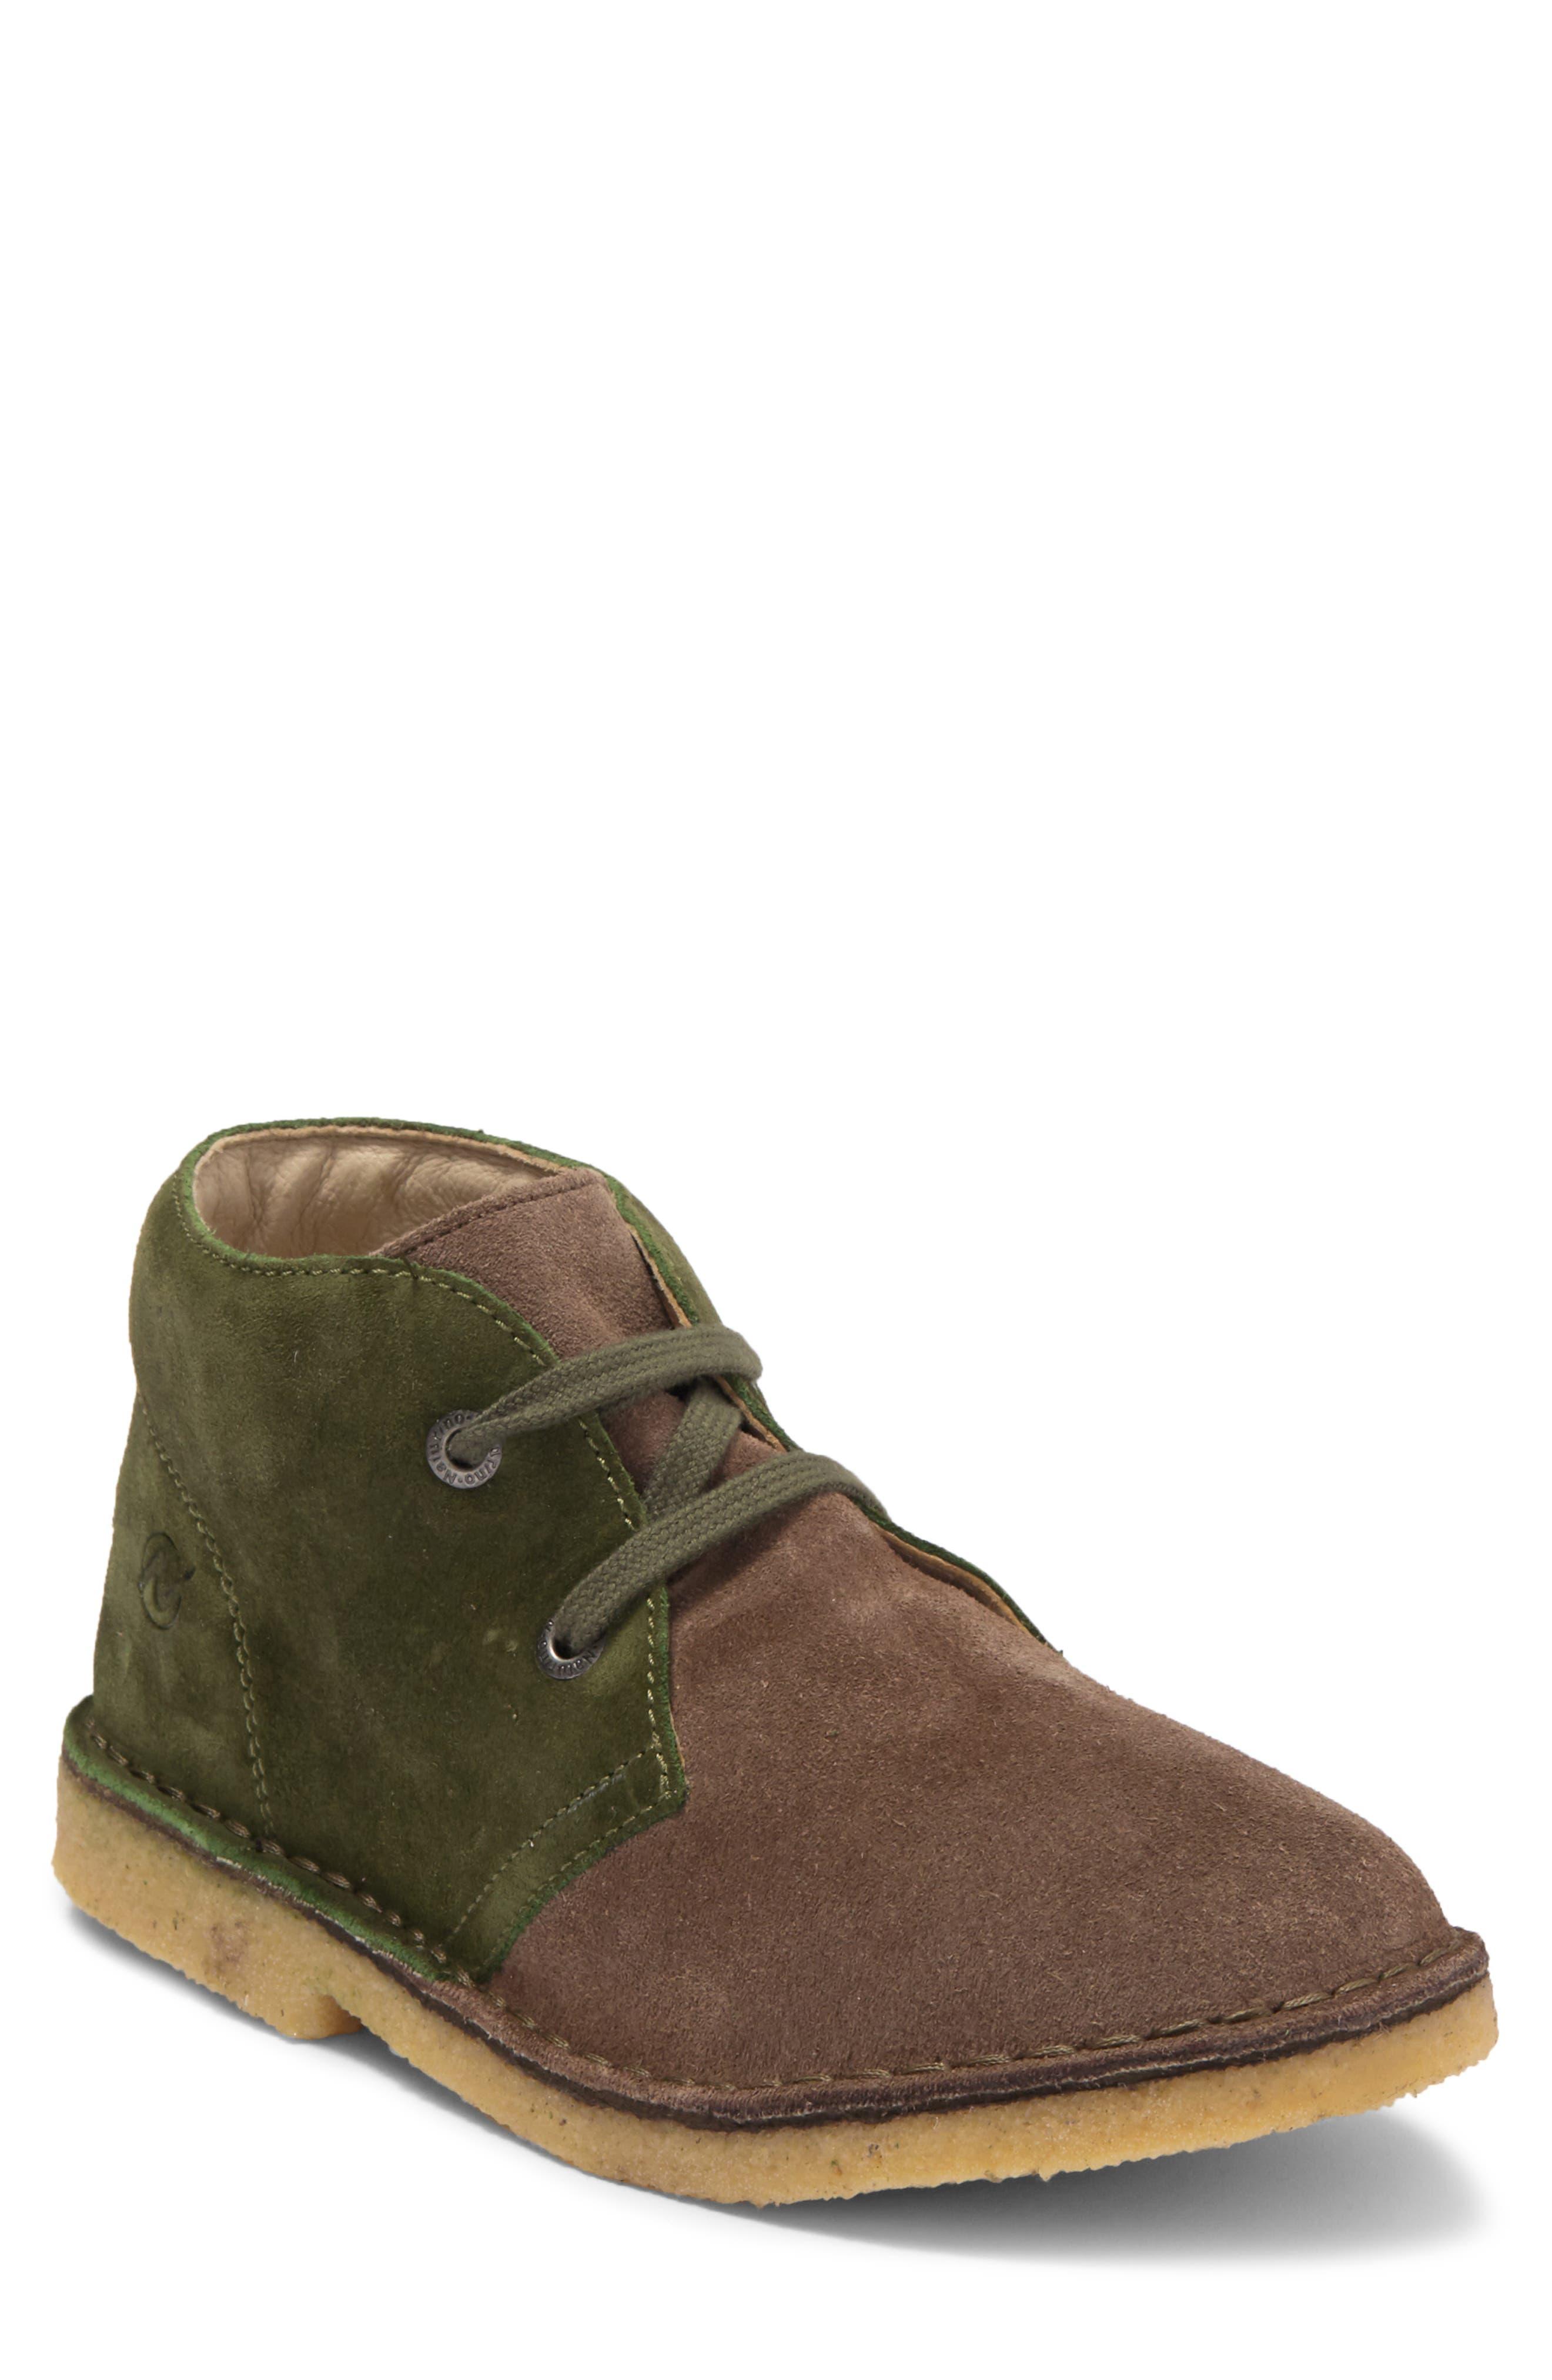 Image of Naturino Two-Tone Suede Chukka Boot